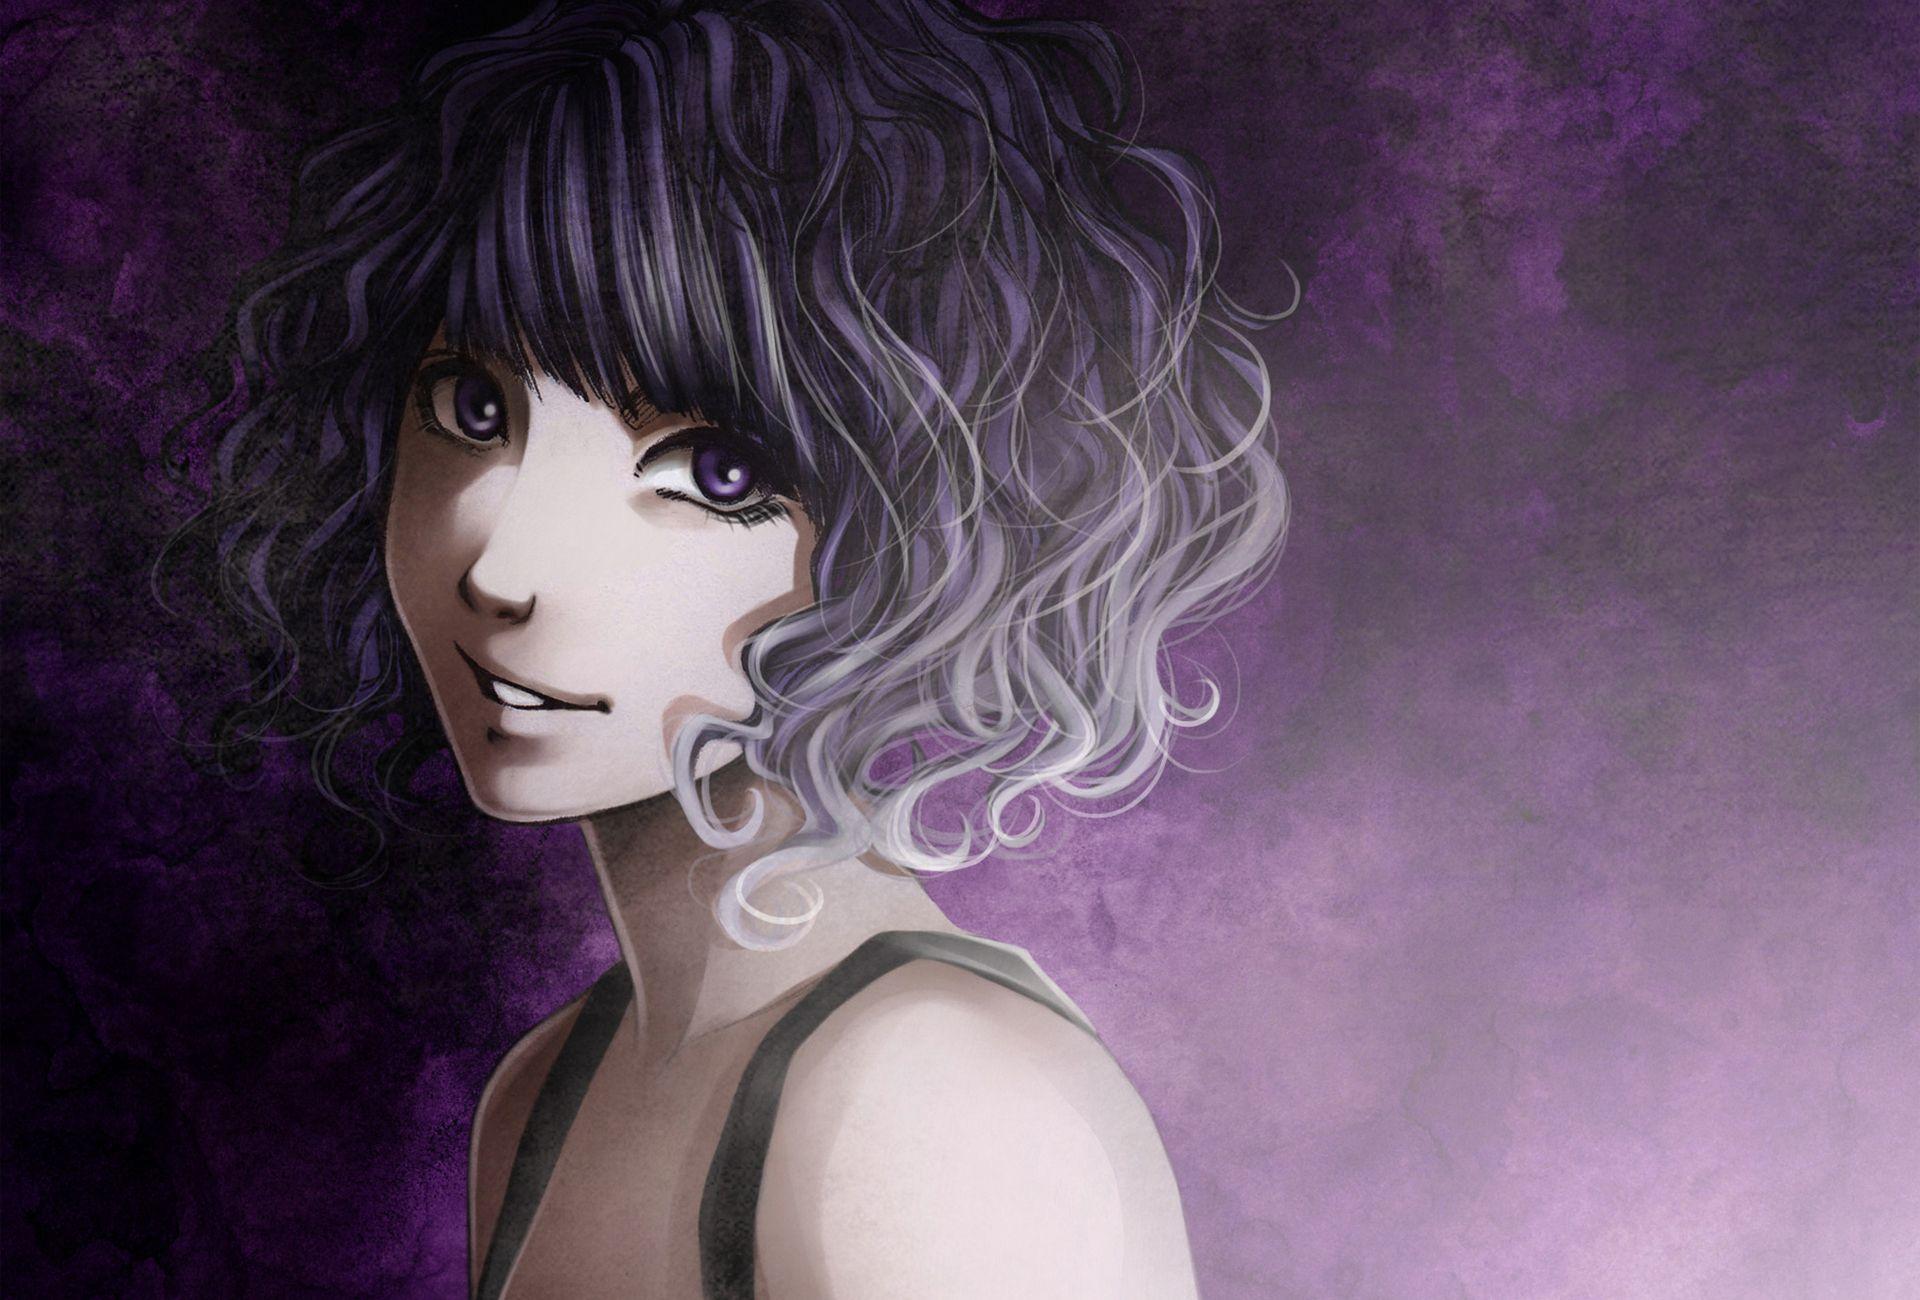 curly hair Darker Anime Pinterest Dark anime and Anime